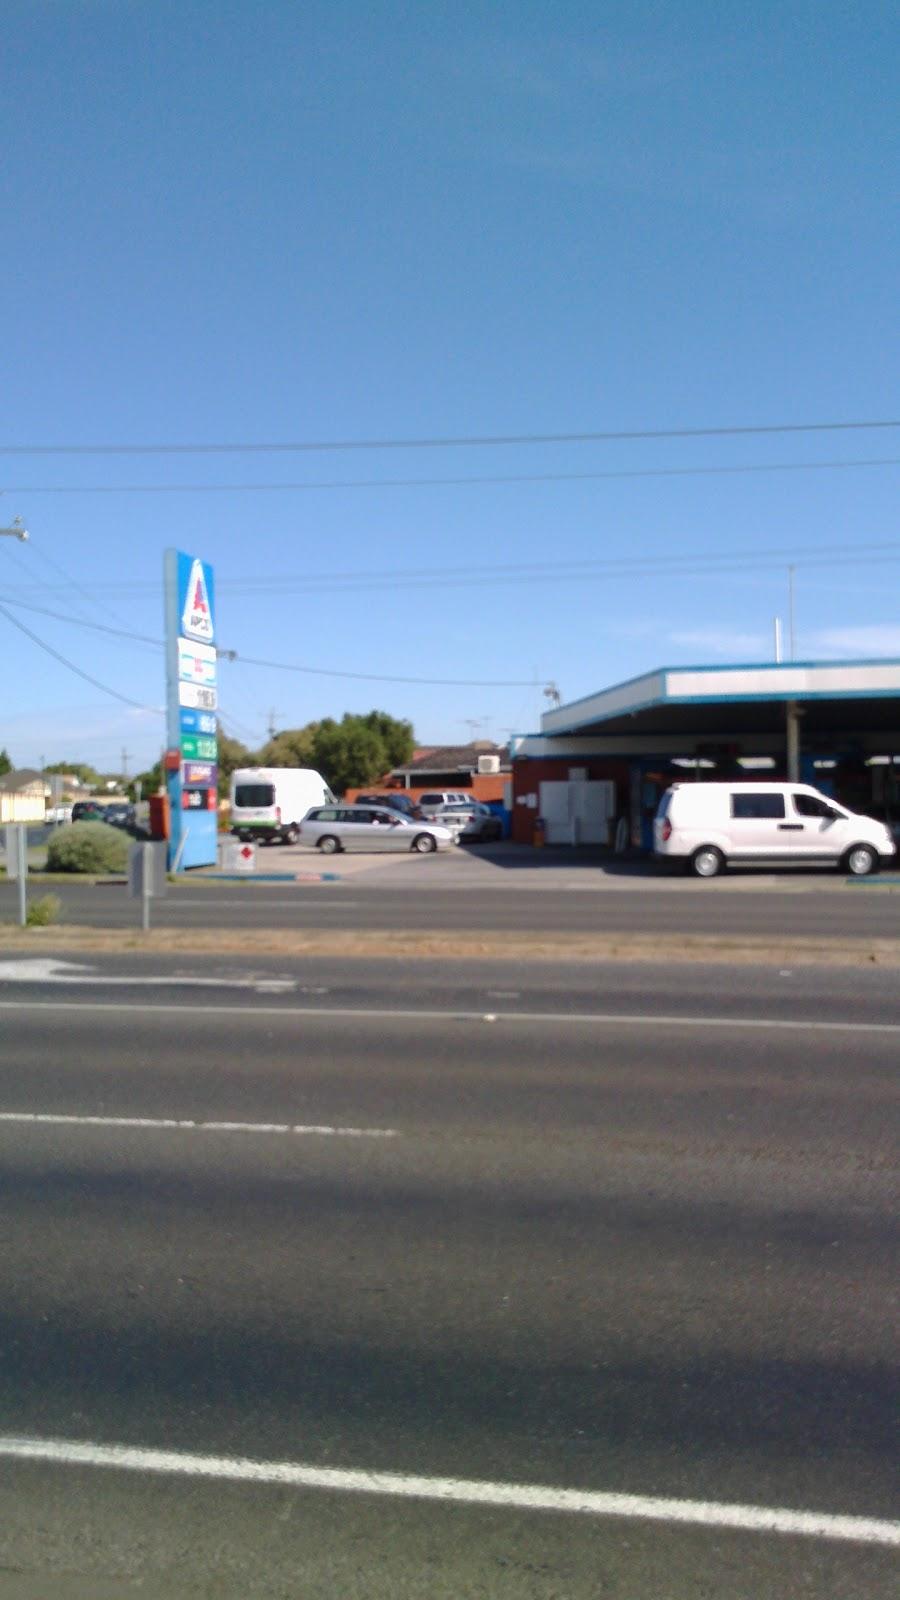 APCO Service Stations Newcomb | gas station | 64 Portarlington Rd, Newcomb VIC 3219, Australia | 0352485100 OR +61 3 5248 5100